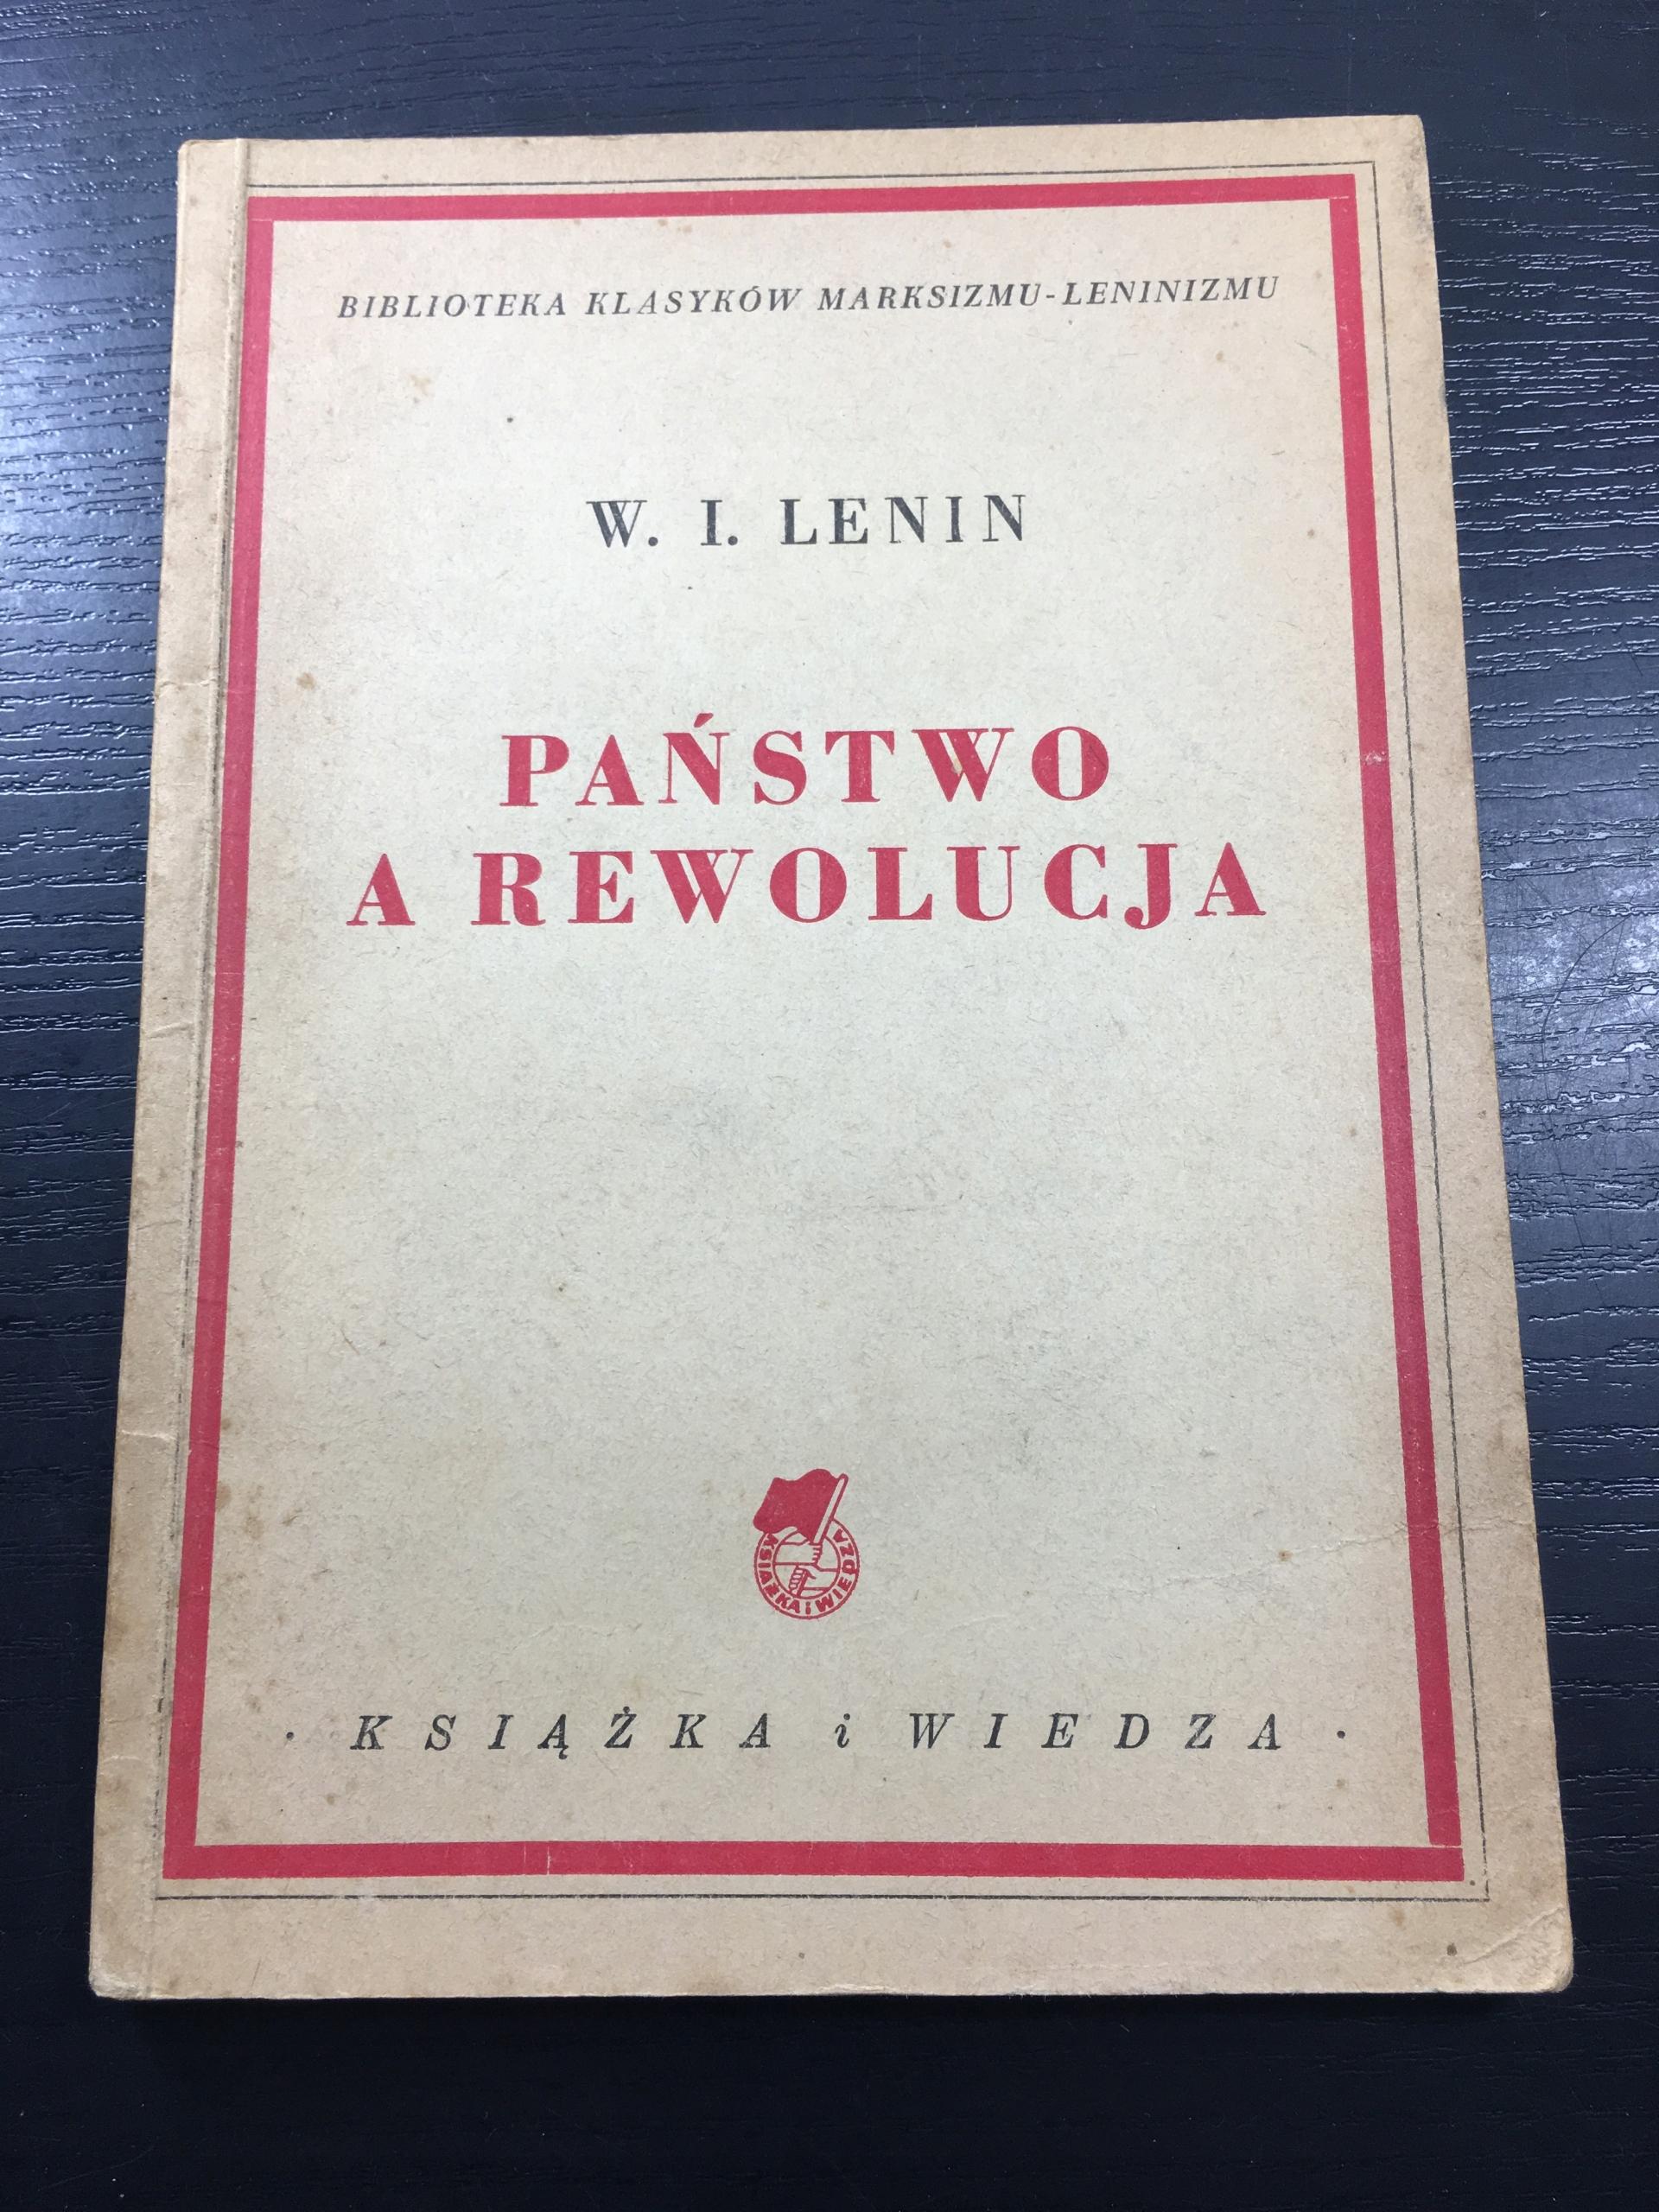 LENIN PAŃSTWO A REWOLUCJA 1950